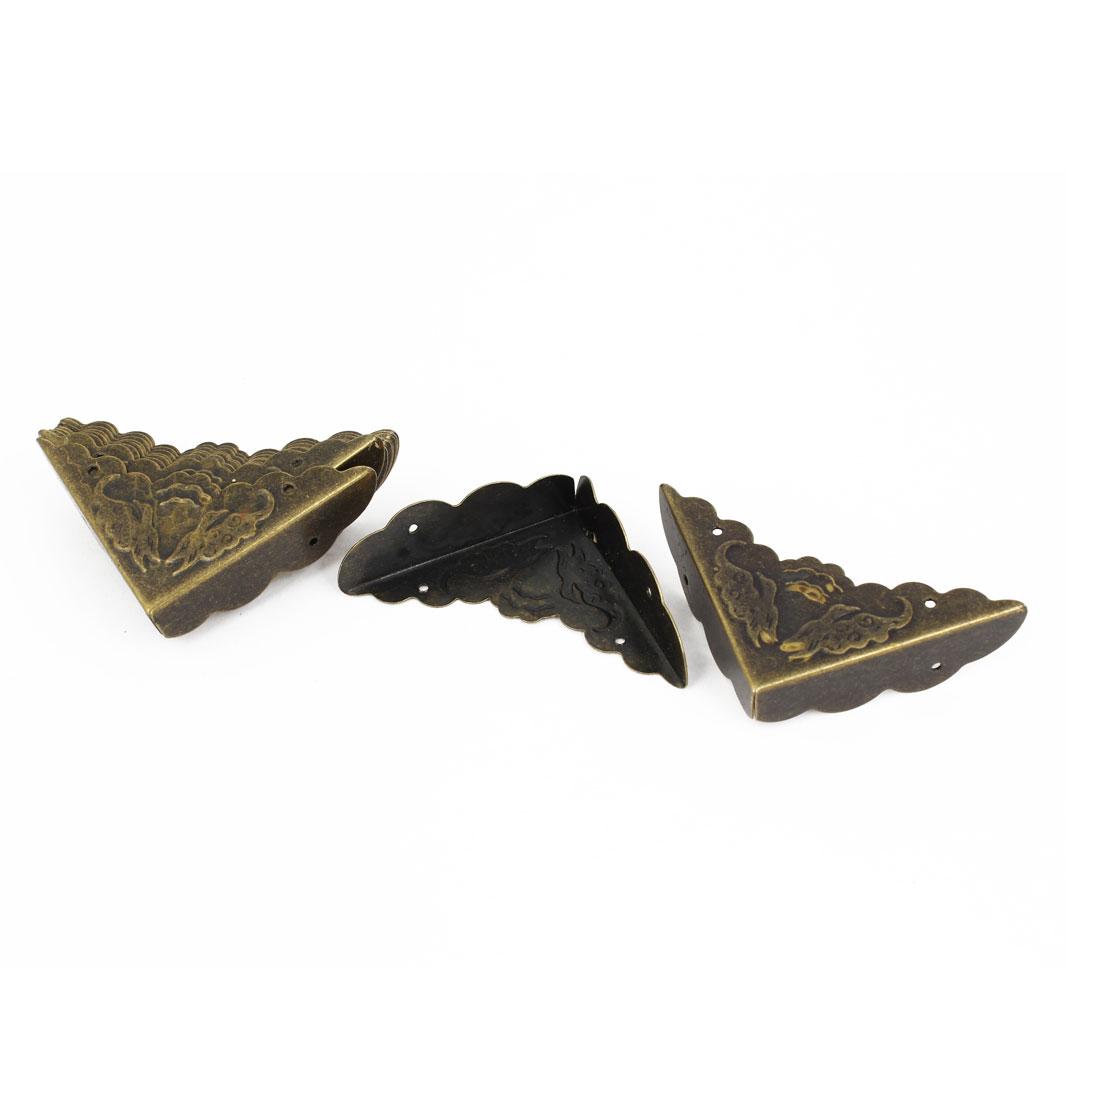 10 Pcs 42mm x 42mm x 42mm Vintage Style Corner Angle Brackets Braces Bronze Tone